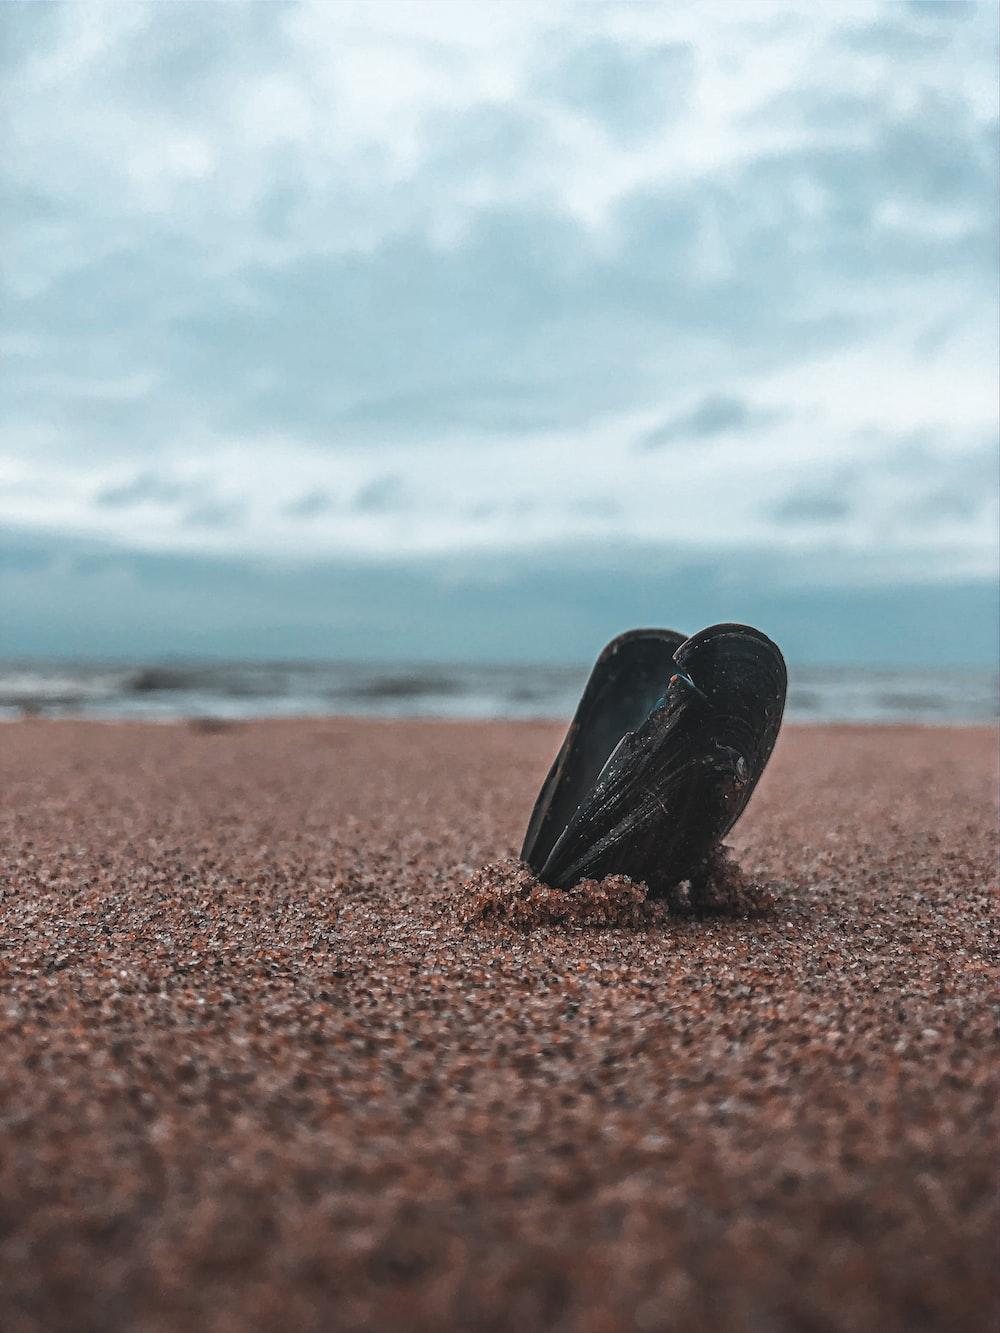 black rock on brown sand during daytime